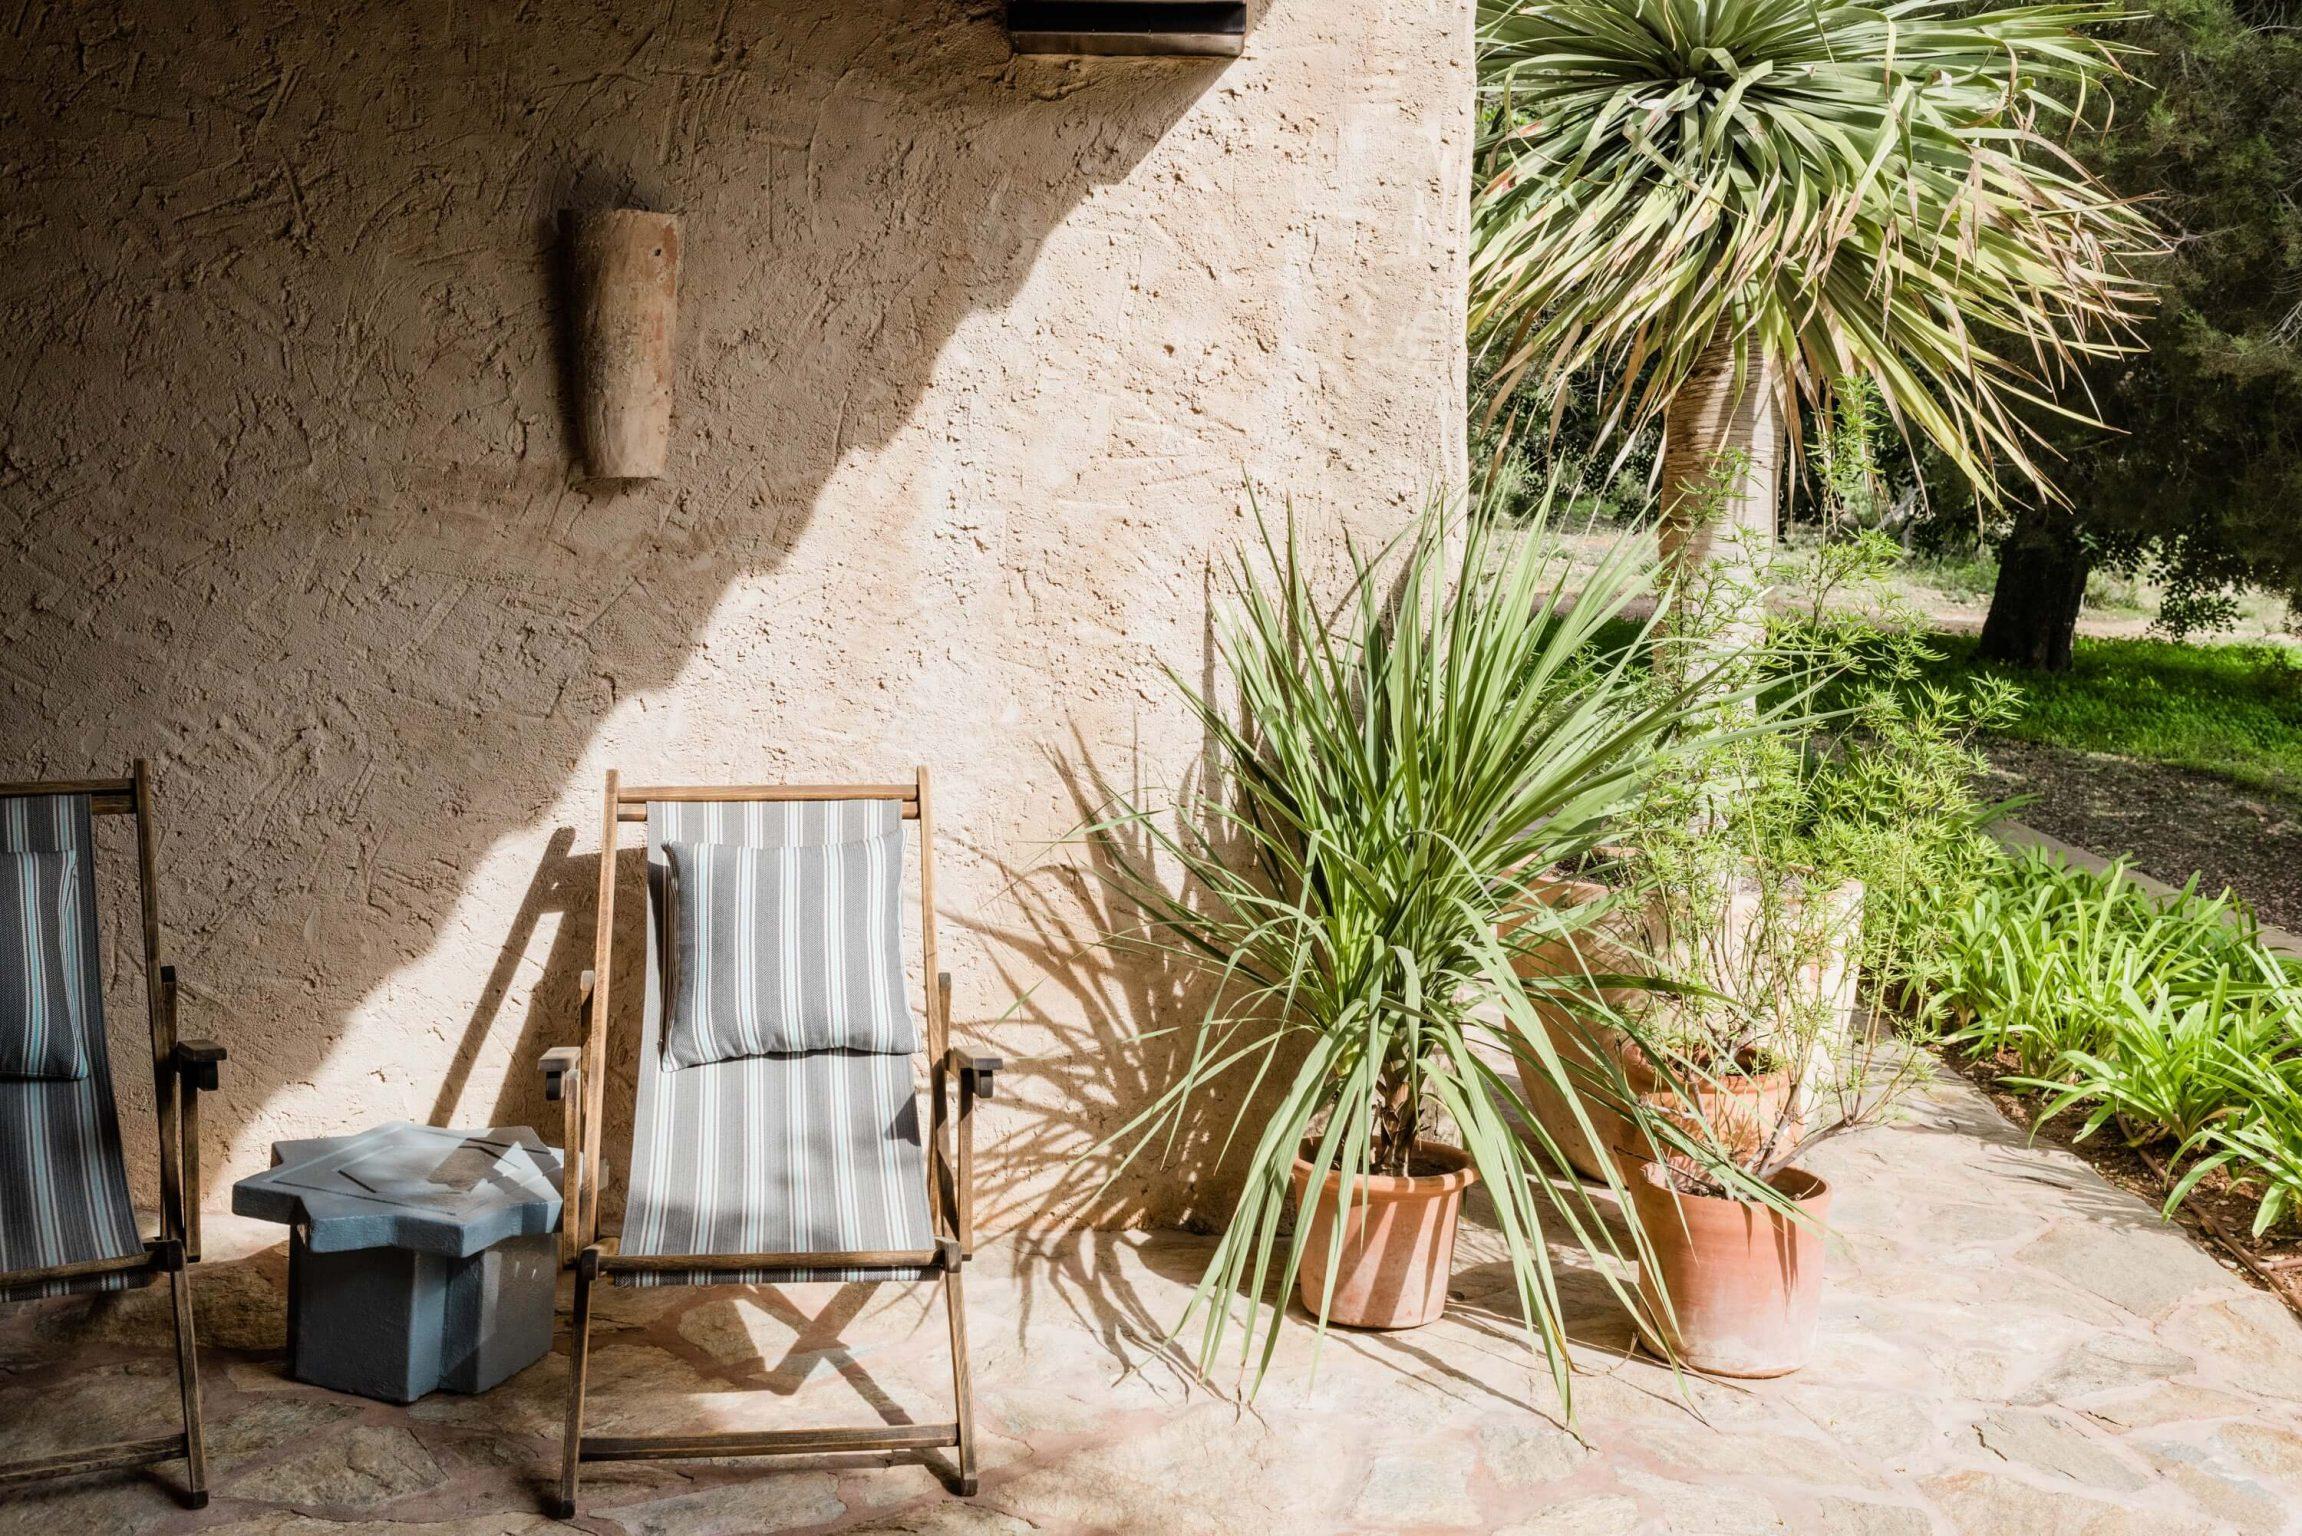 https://www.white-ibiza.com/wp-content/uploads/2020/05/white-ibiza-villas-can-sabina-exterior-deckchairs-2302x1536.jpg